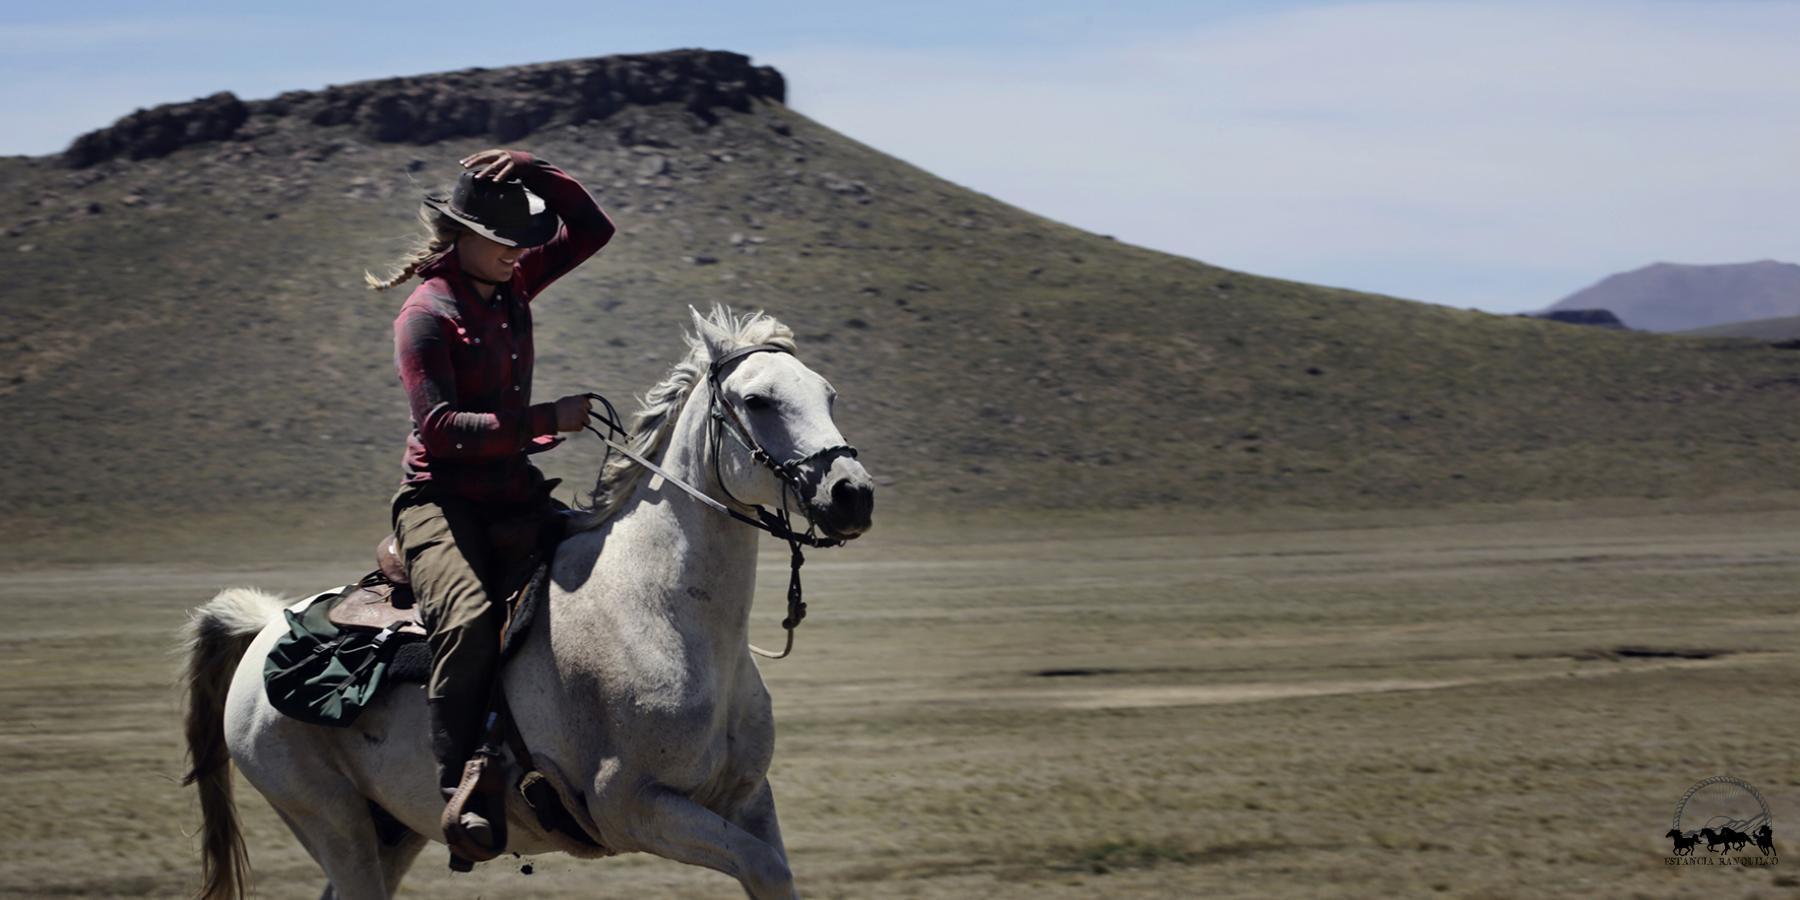 horseback adventures through in Patagonia